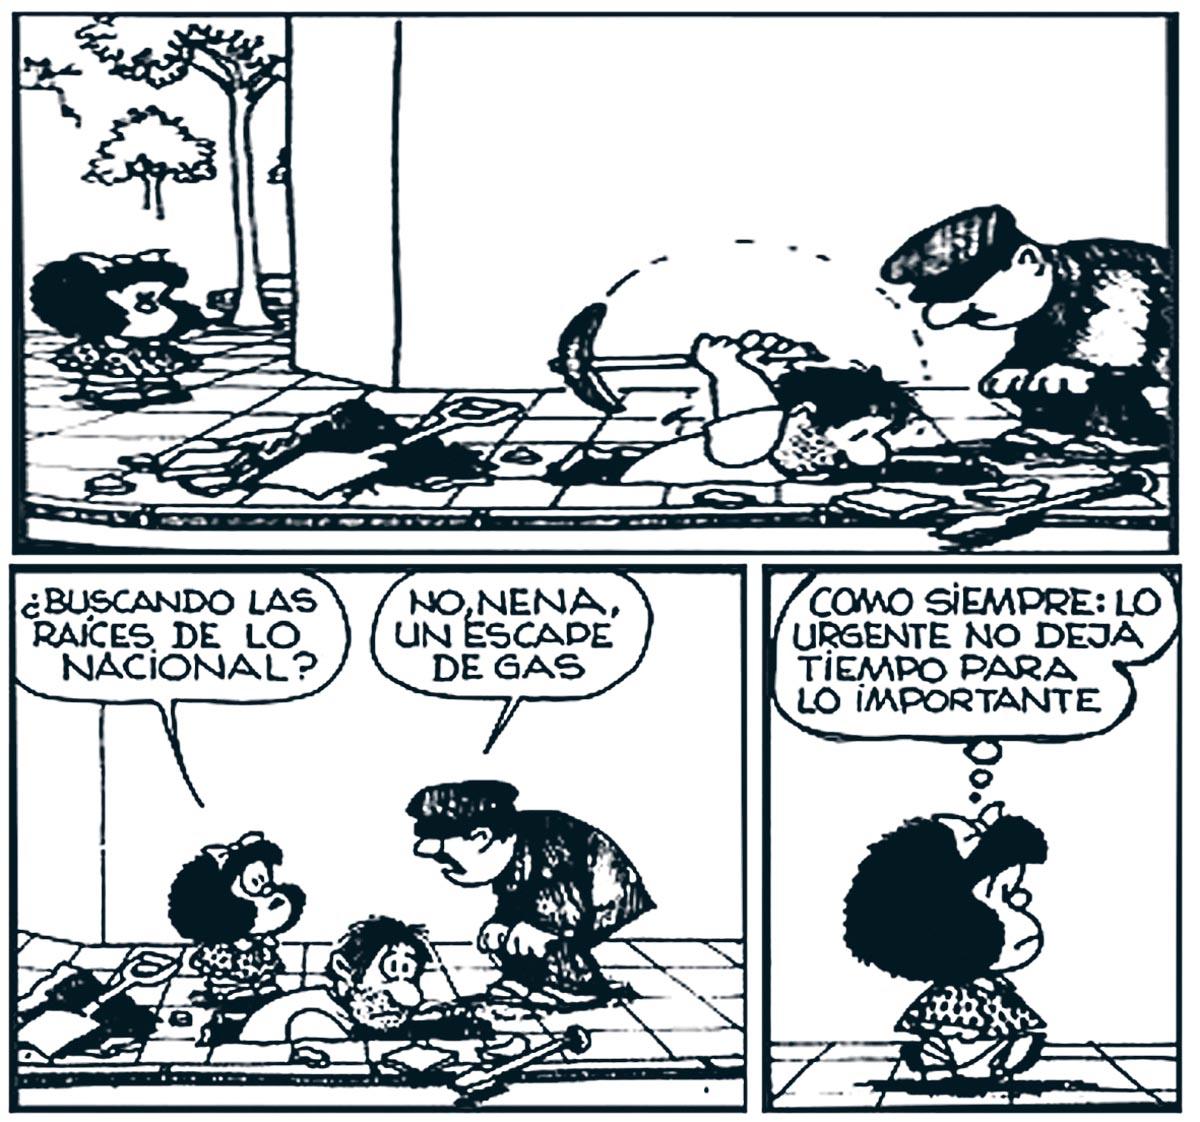 foto-martinez-uade-mafalda_9_urgente